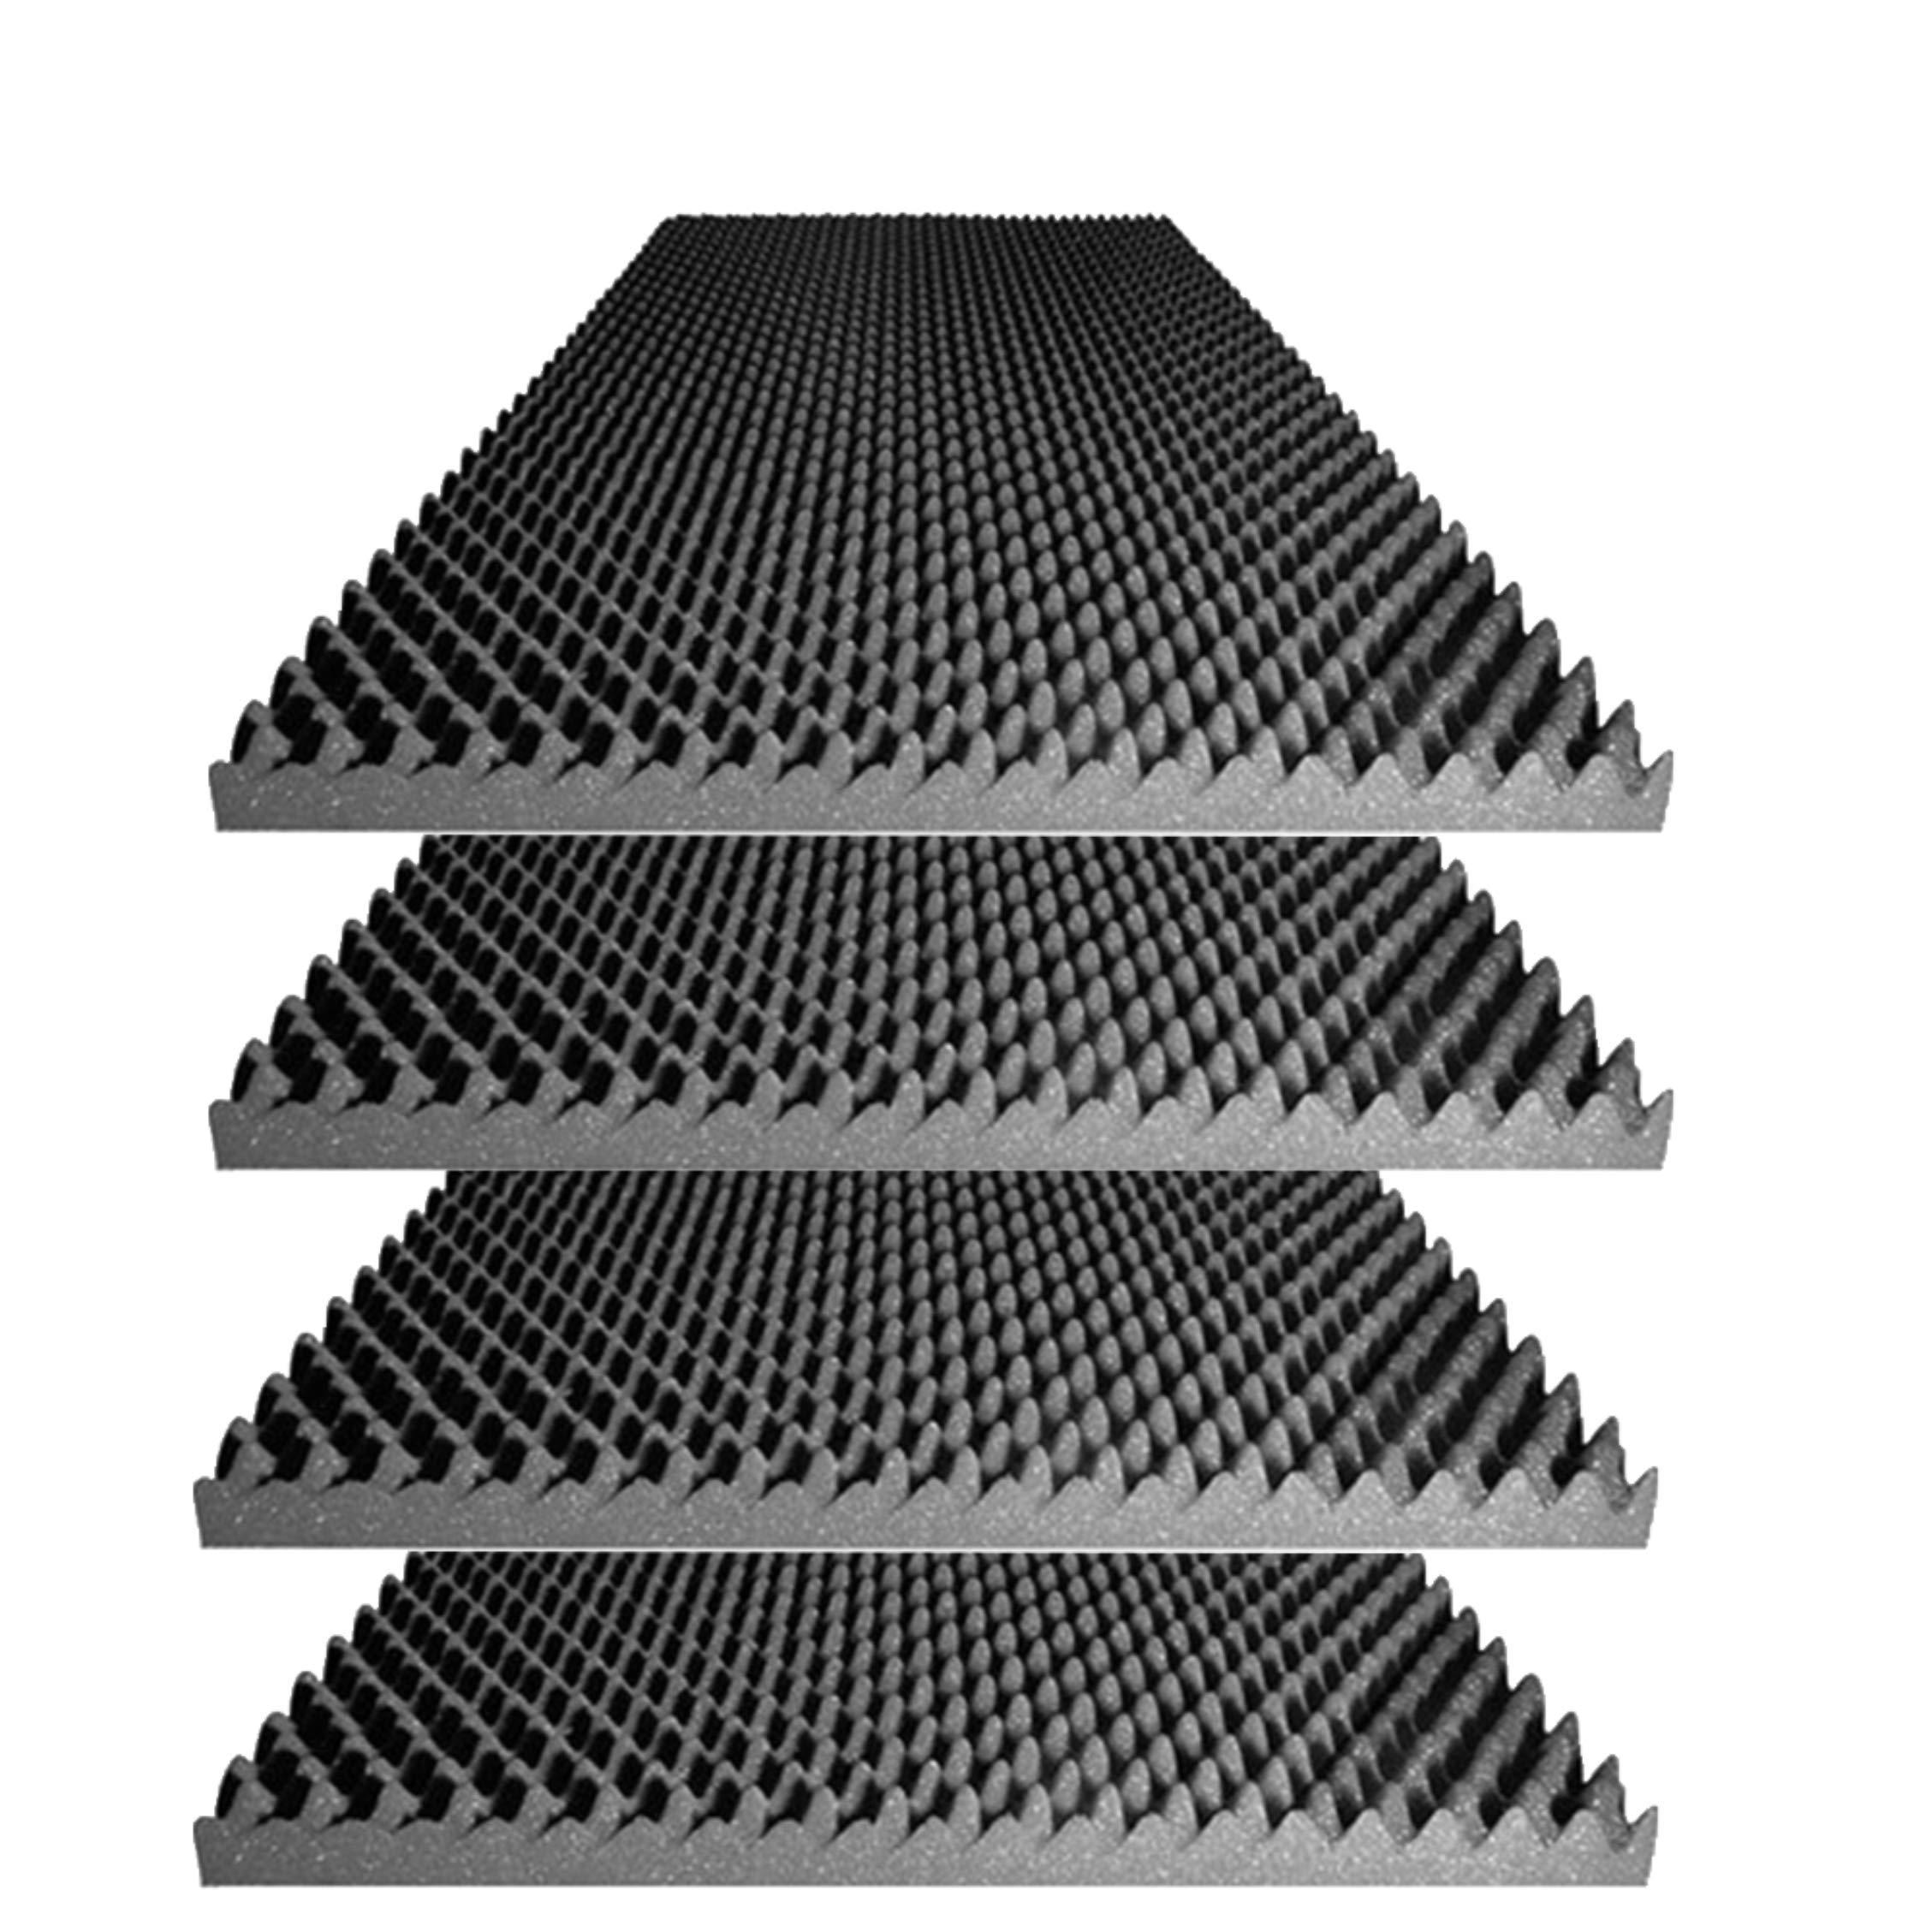 Foamily Acoustic Foam Egg Crate Panel Studio Foam Wall Panel 48'' X 24'' X 2.5'' (4 Pack)